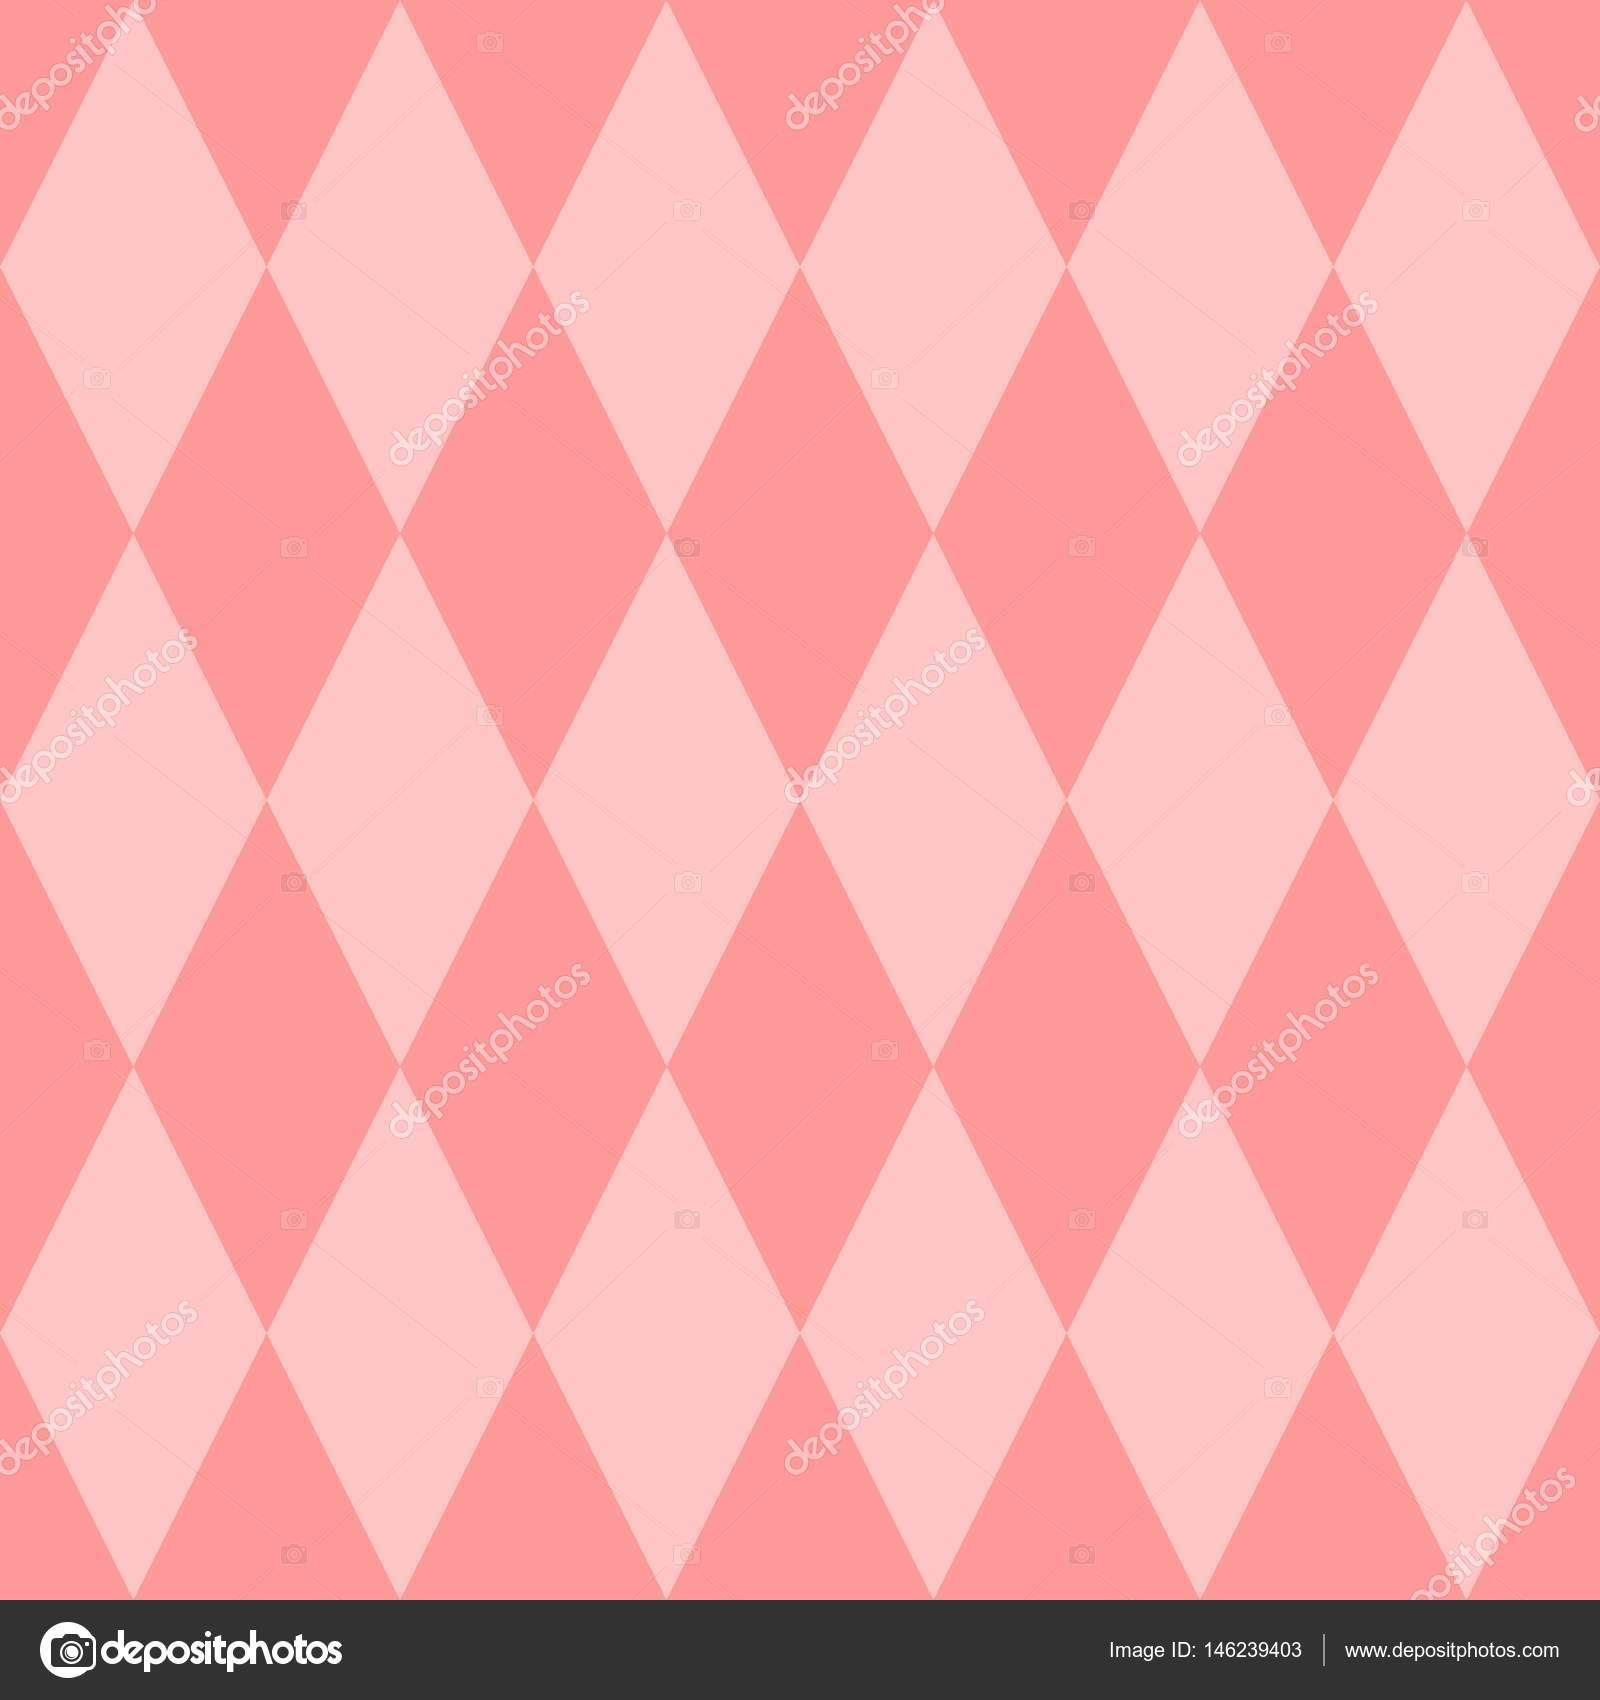 azulejo rosa vector patrn de papel pintado decoracin transparente vector de mala ma - Azulejos Rosa